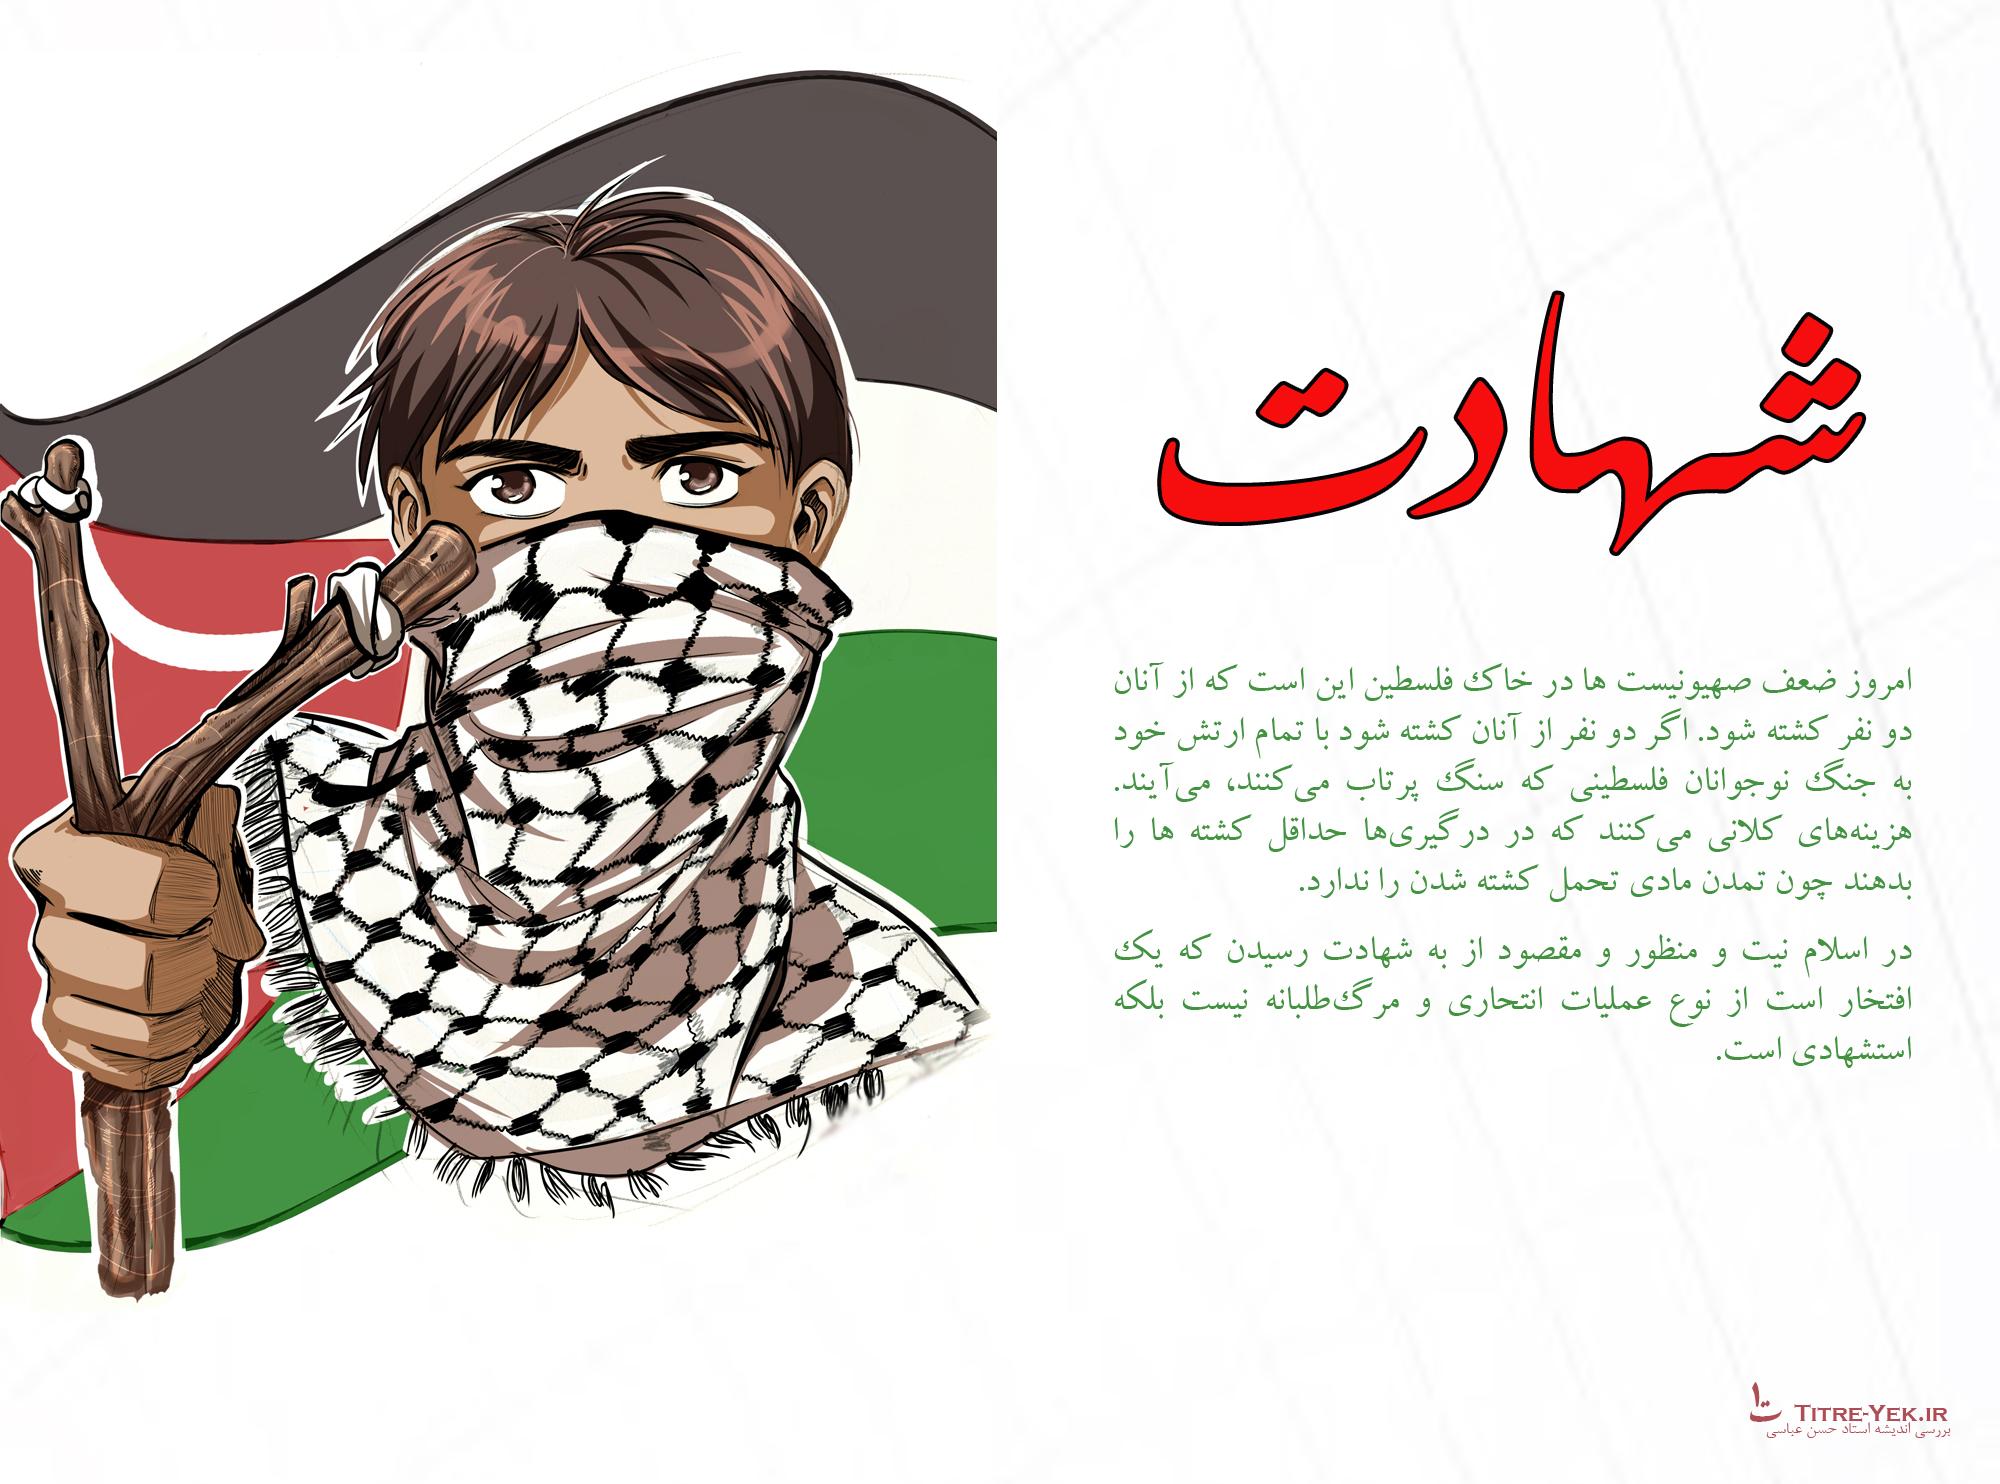 http://s5.picofile.com/file/8131711926/Palestin_TitreYek.jpg